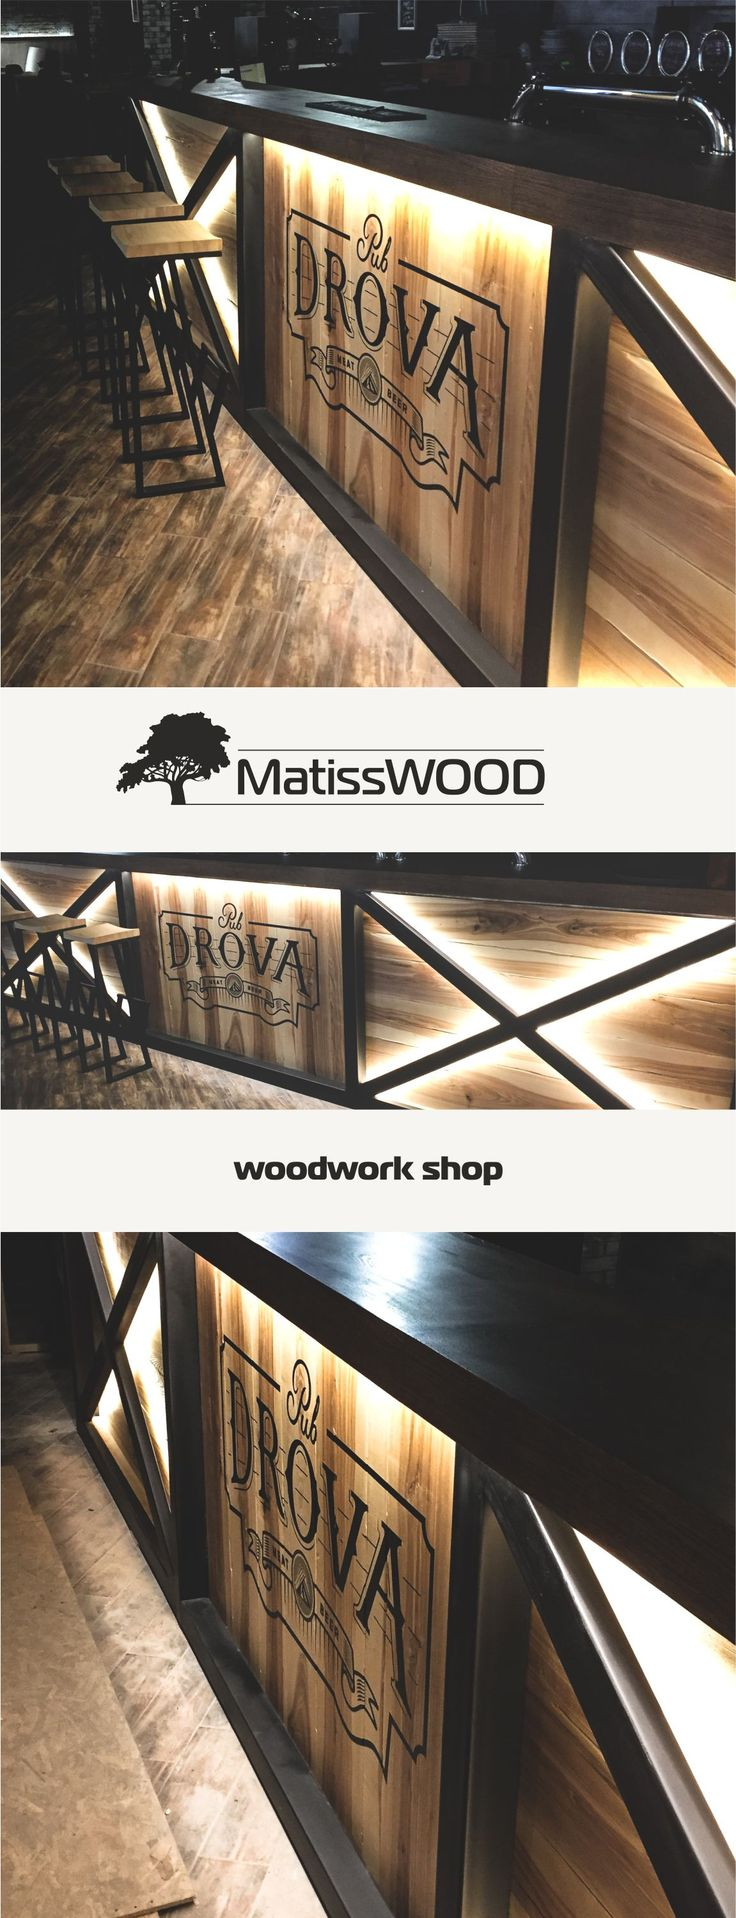 Bar rack | Барная стойка. MatissWOOD Kirovograd #woodwork #wood#woodworking #kitchen #naturalwood #kirovograd #woodkitchen #pub #lighting #light #food #restaurant #cafe